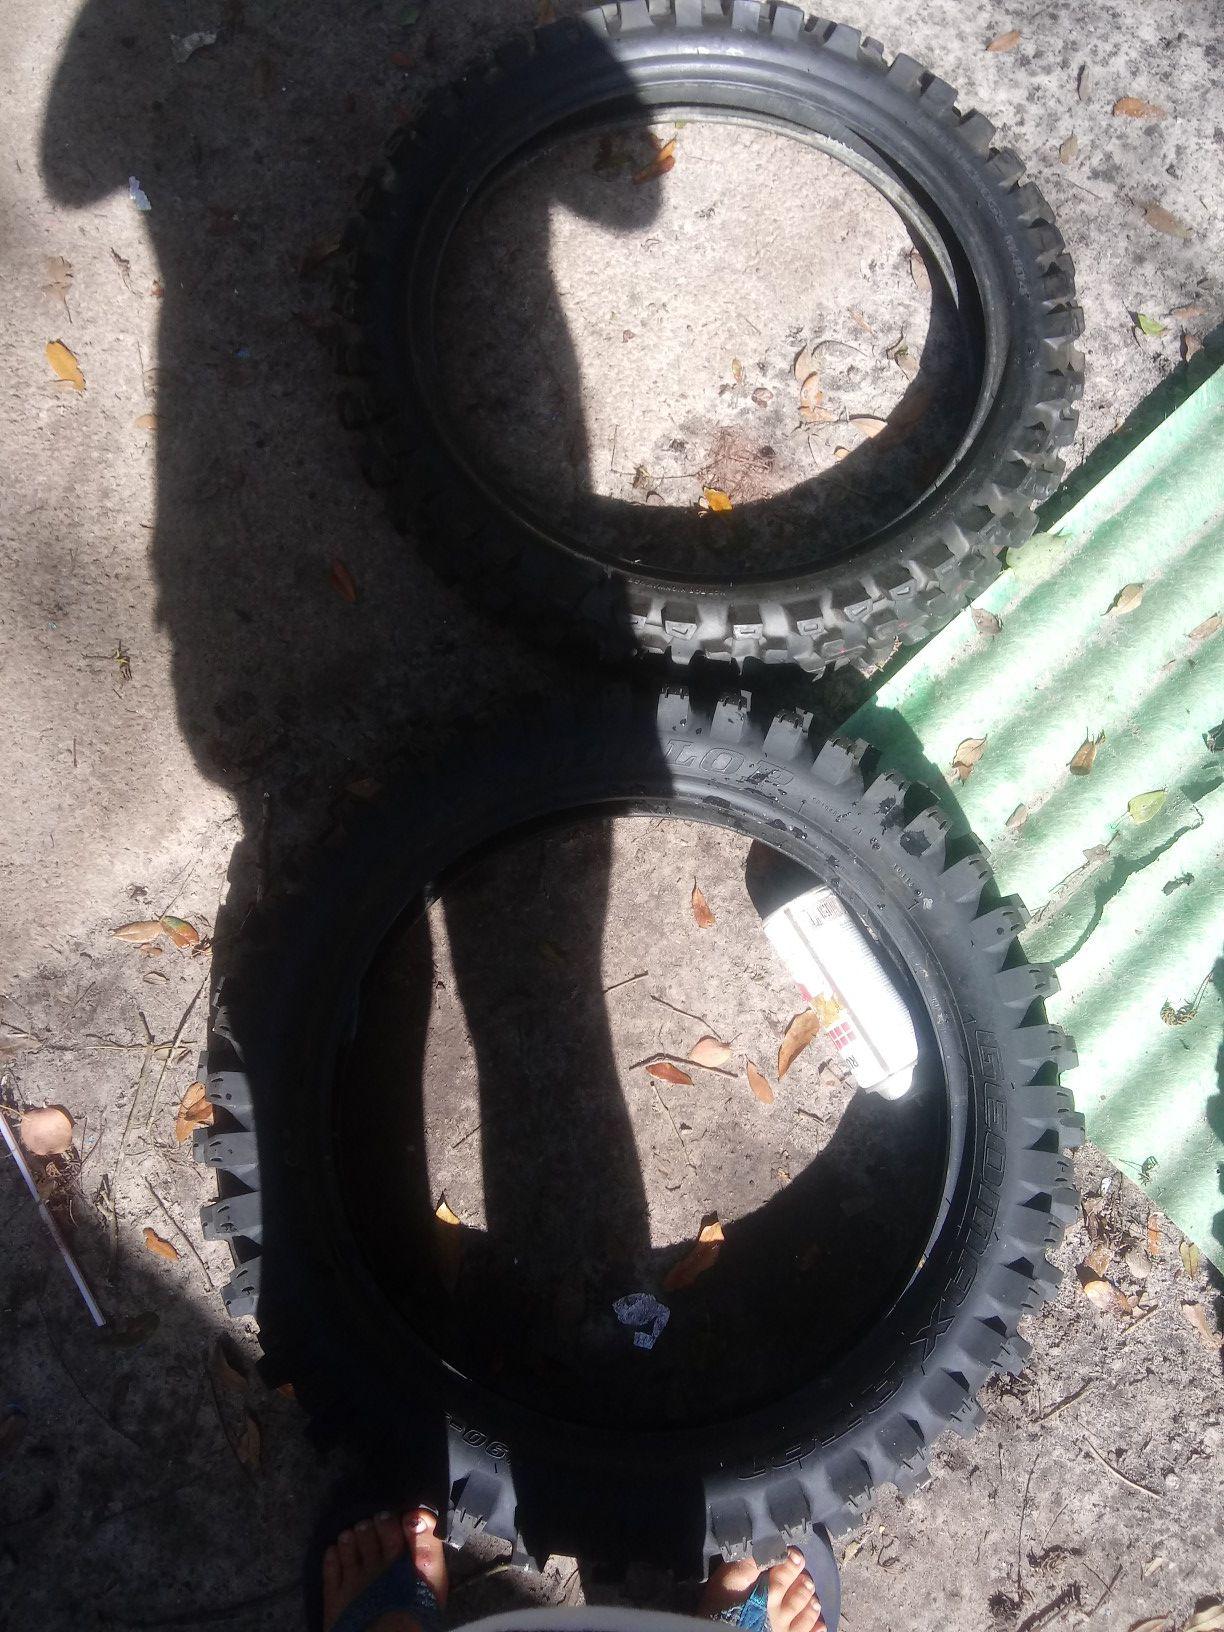 New dirt bike tires